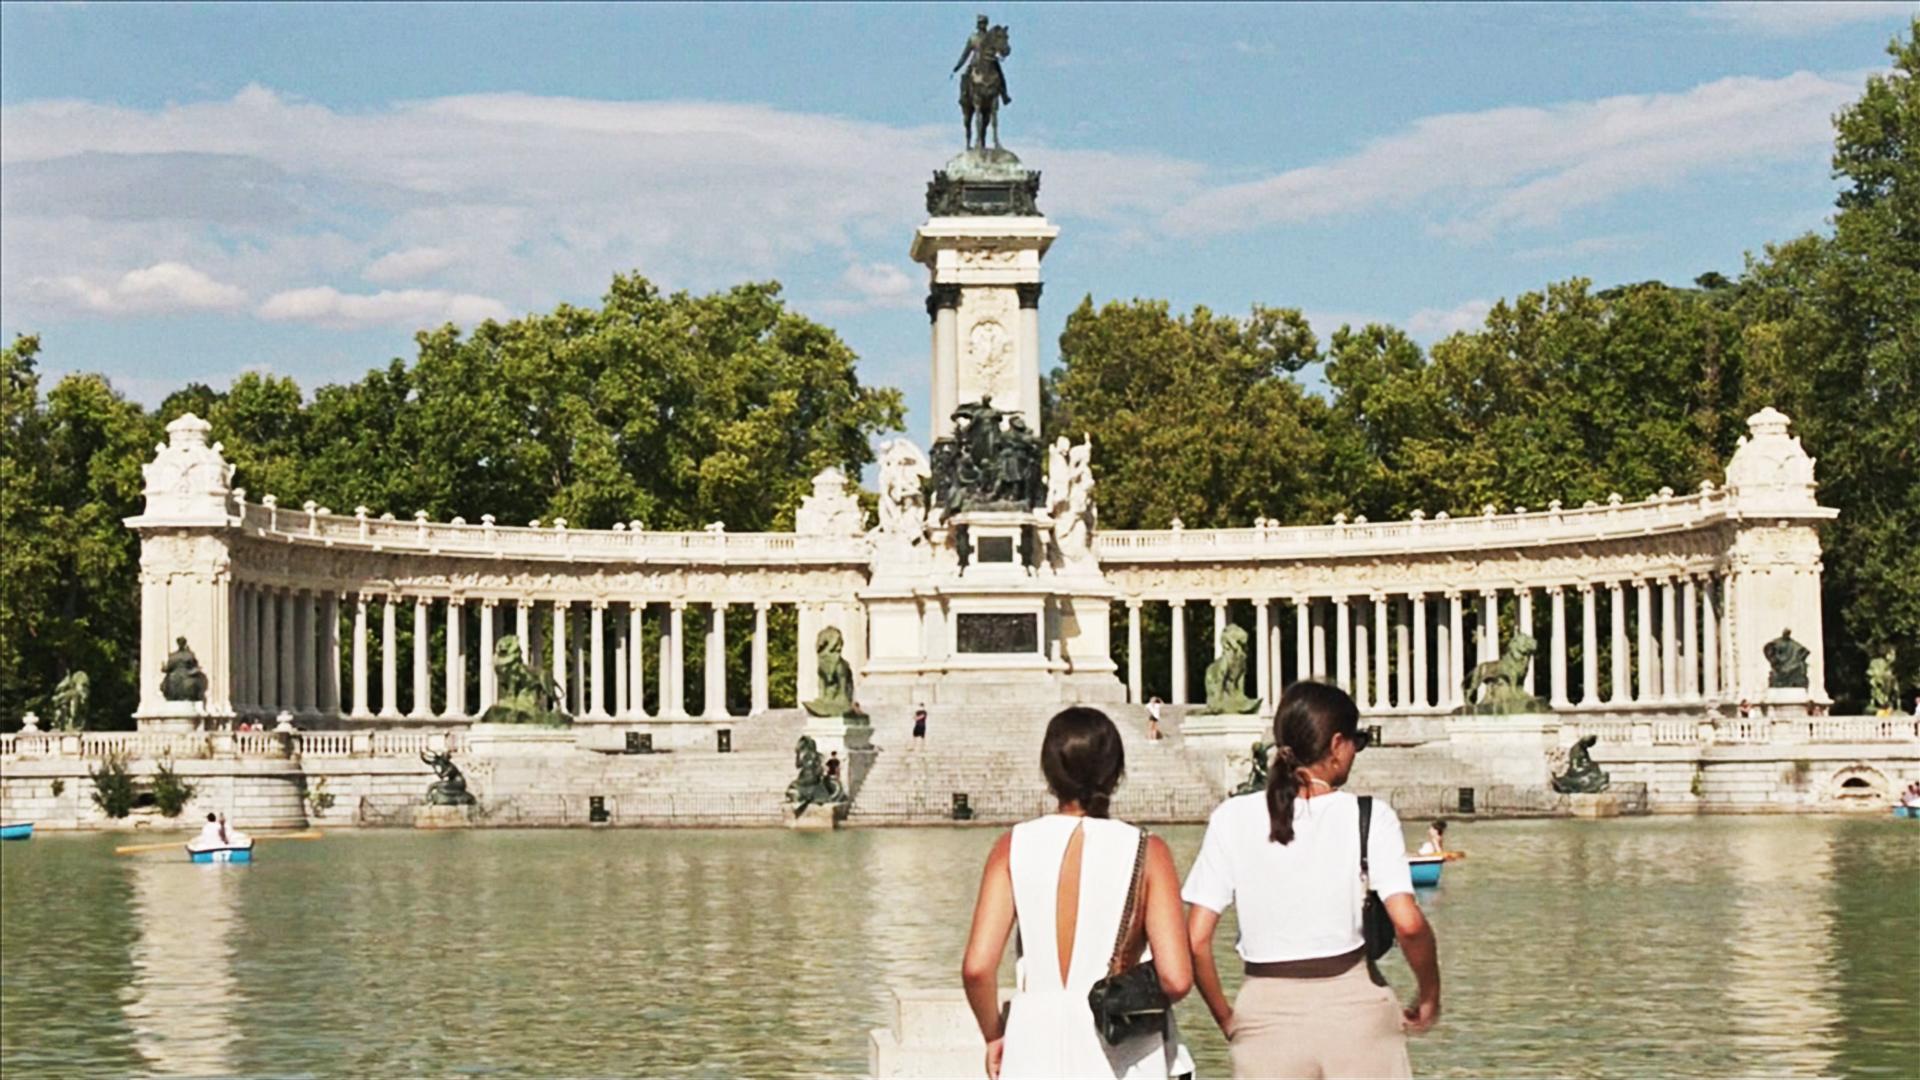 За что парк и бульвар Мадрида включили список ЮНЕСКО